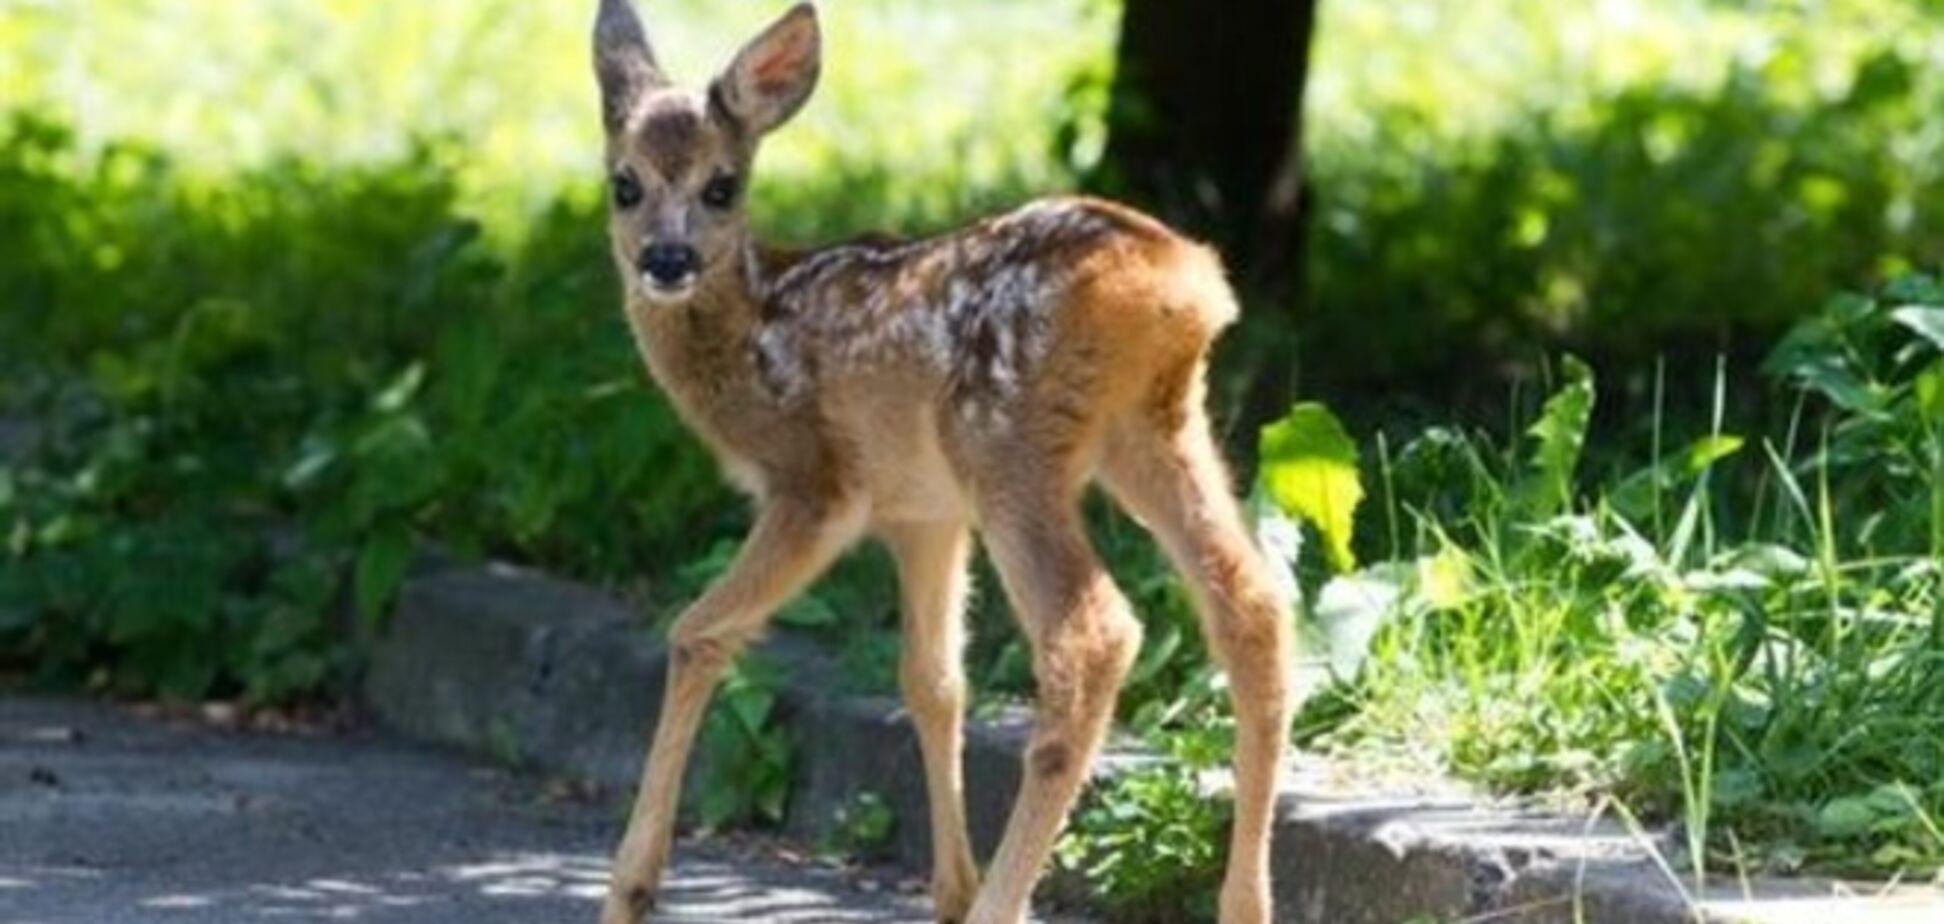 У київському зоопарку померла остання косуля